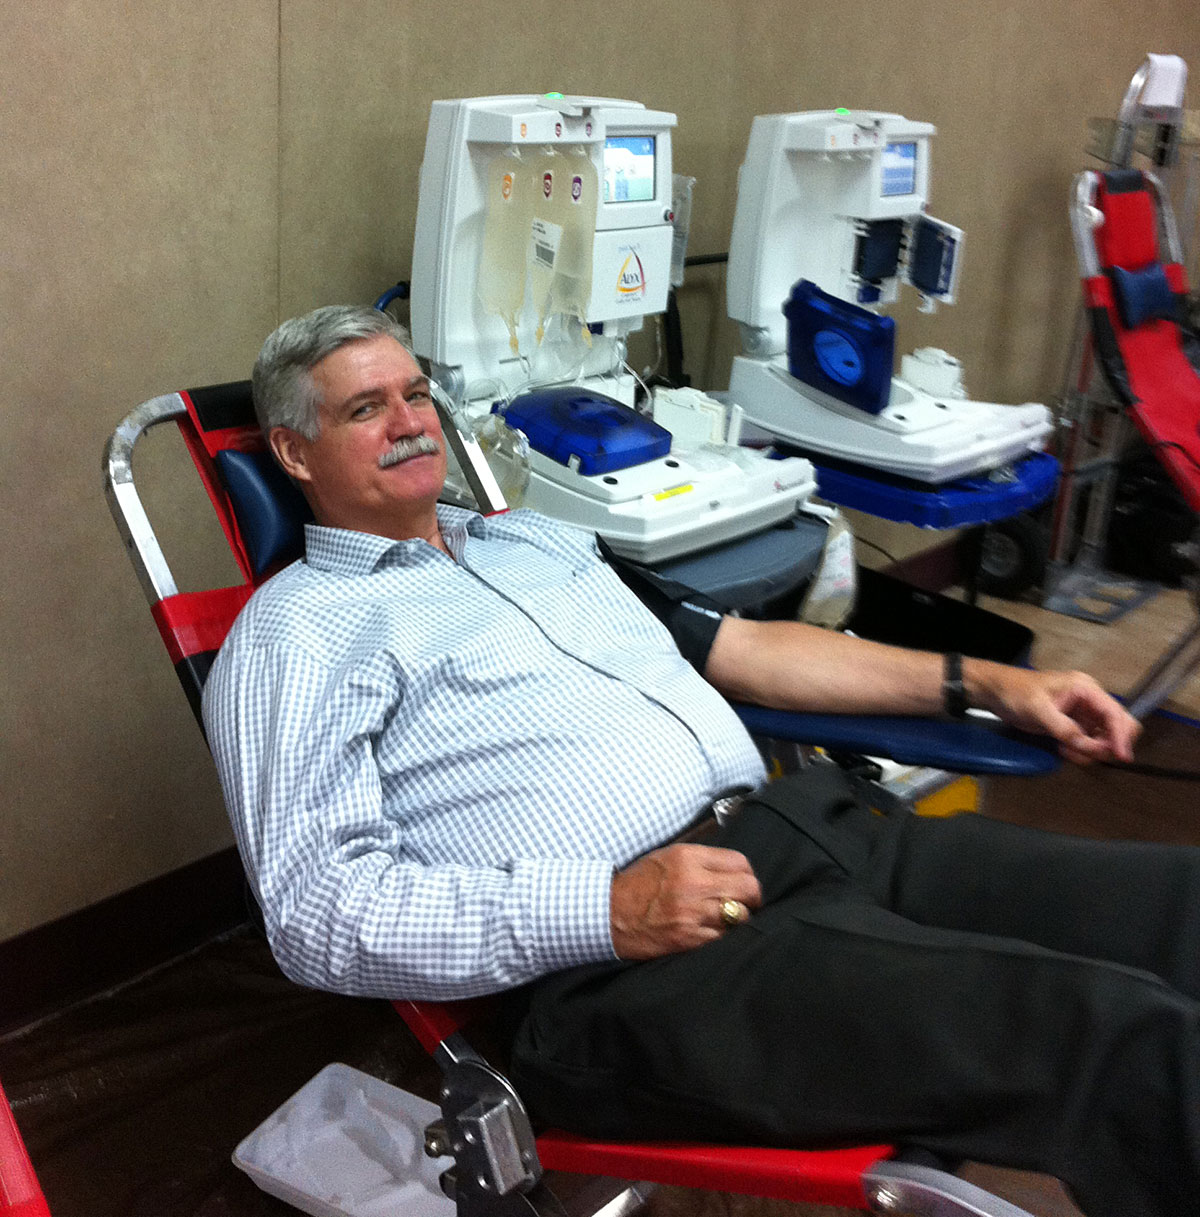 david-dybala-donates